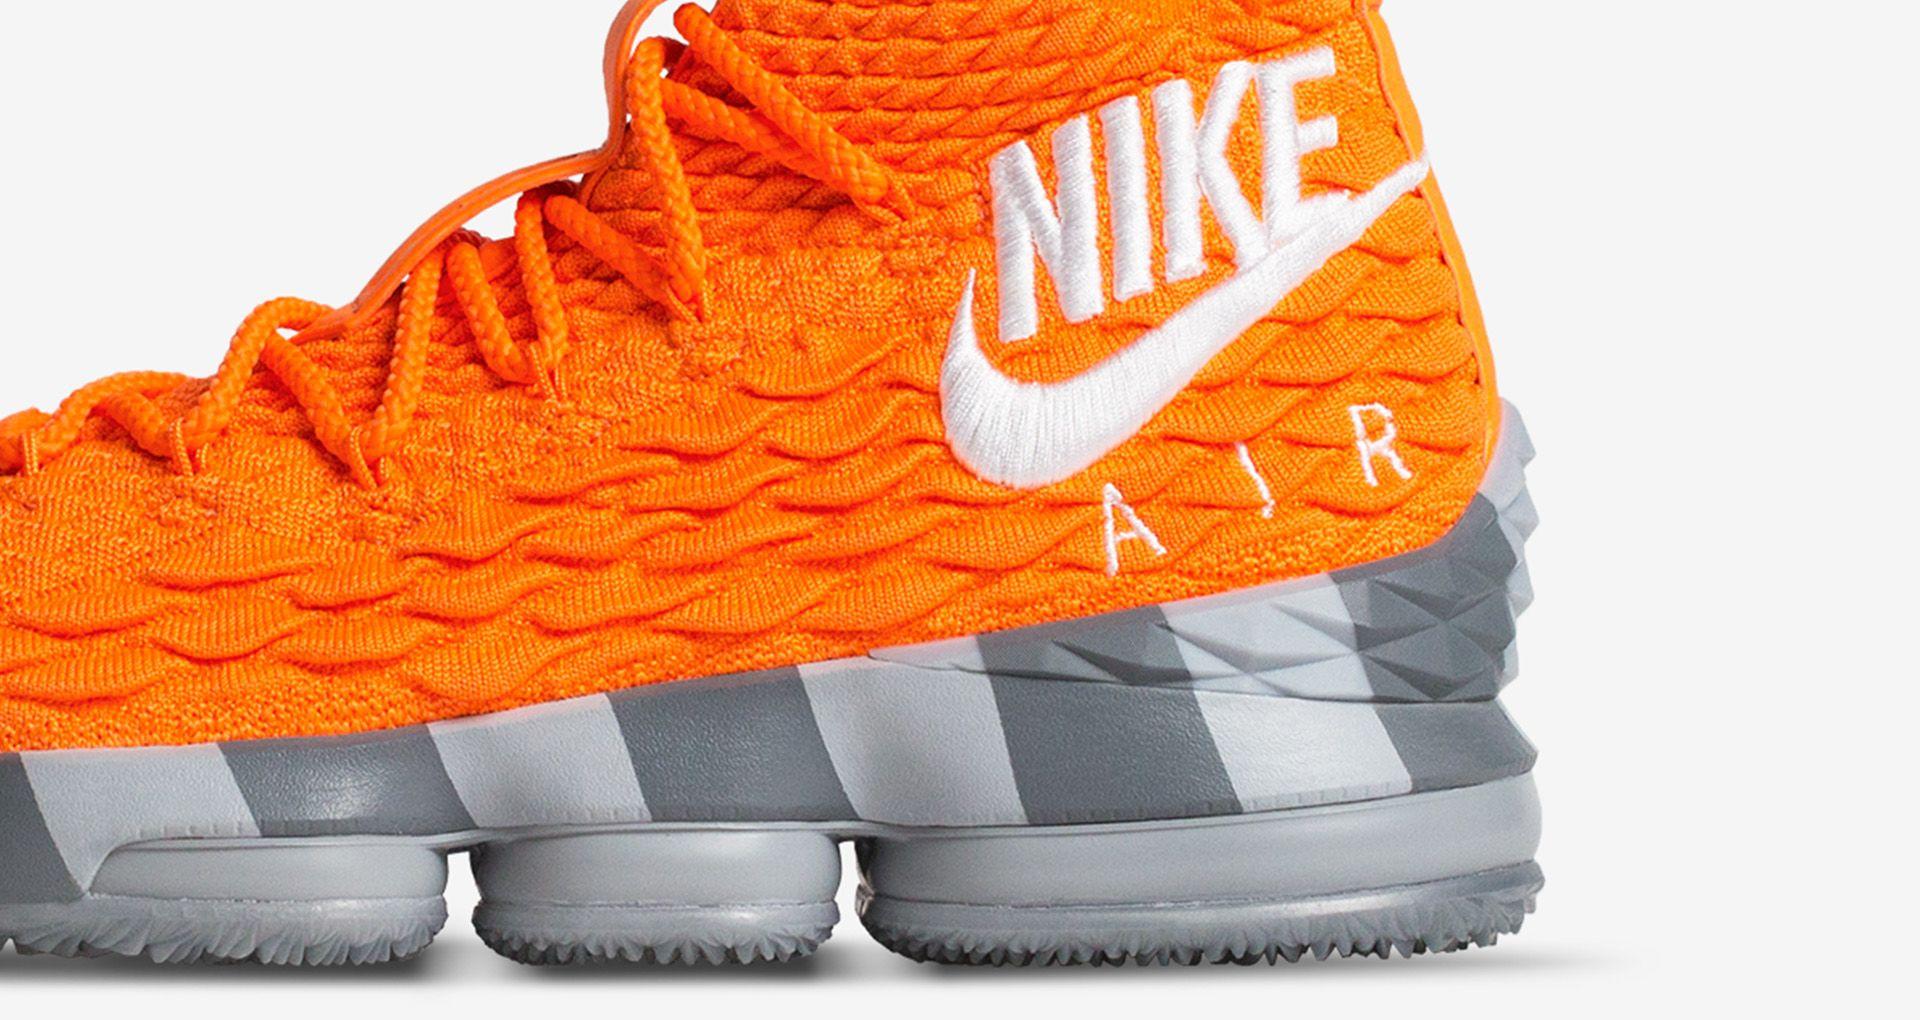 newest c44e4 66037 Nike Lebron 15 Orange Box Release Date